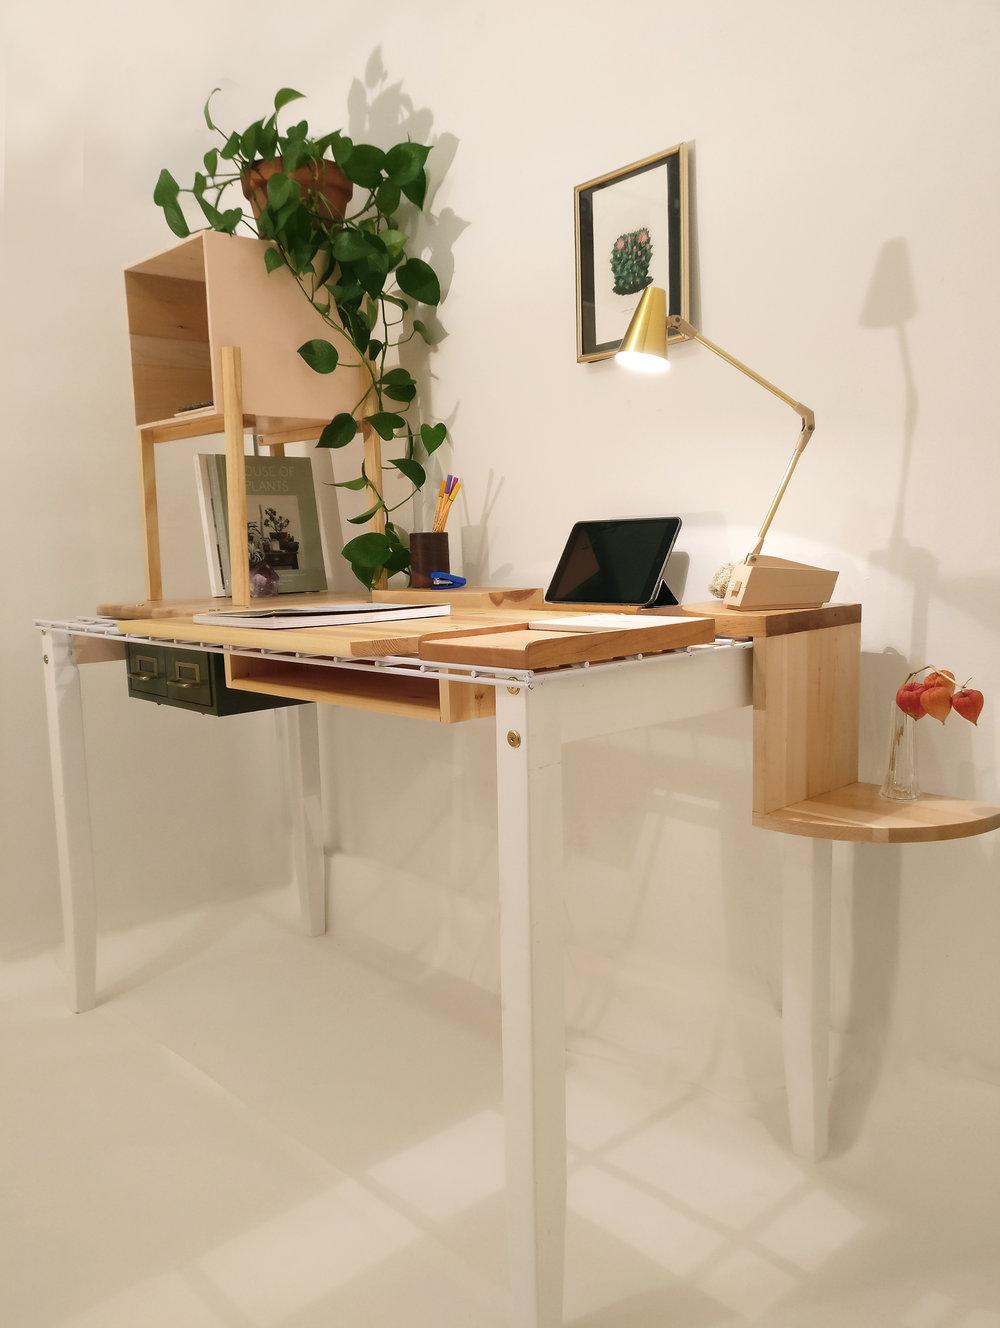 Nuvem desk, projecteighteight, designer, myriam rigaud, wood design, design object